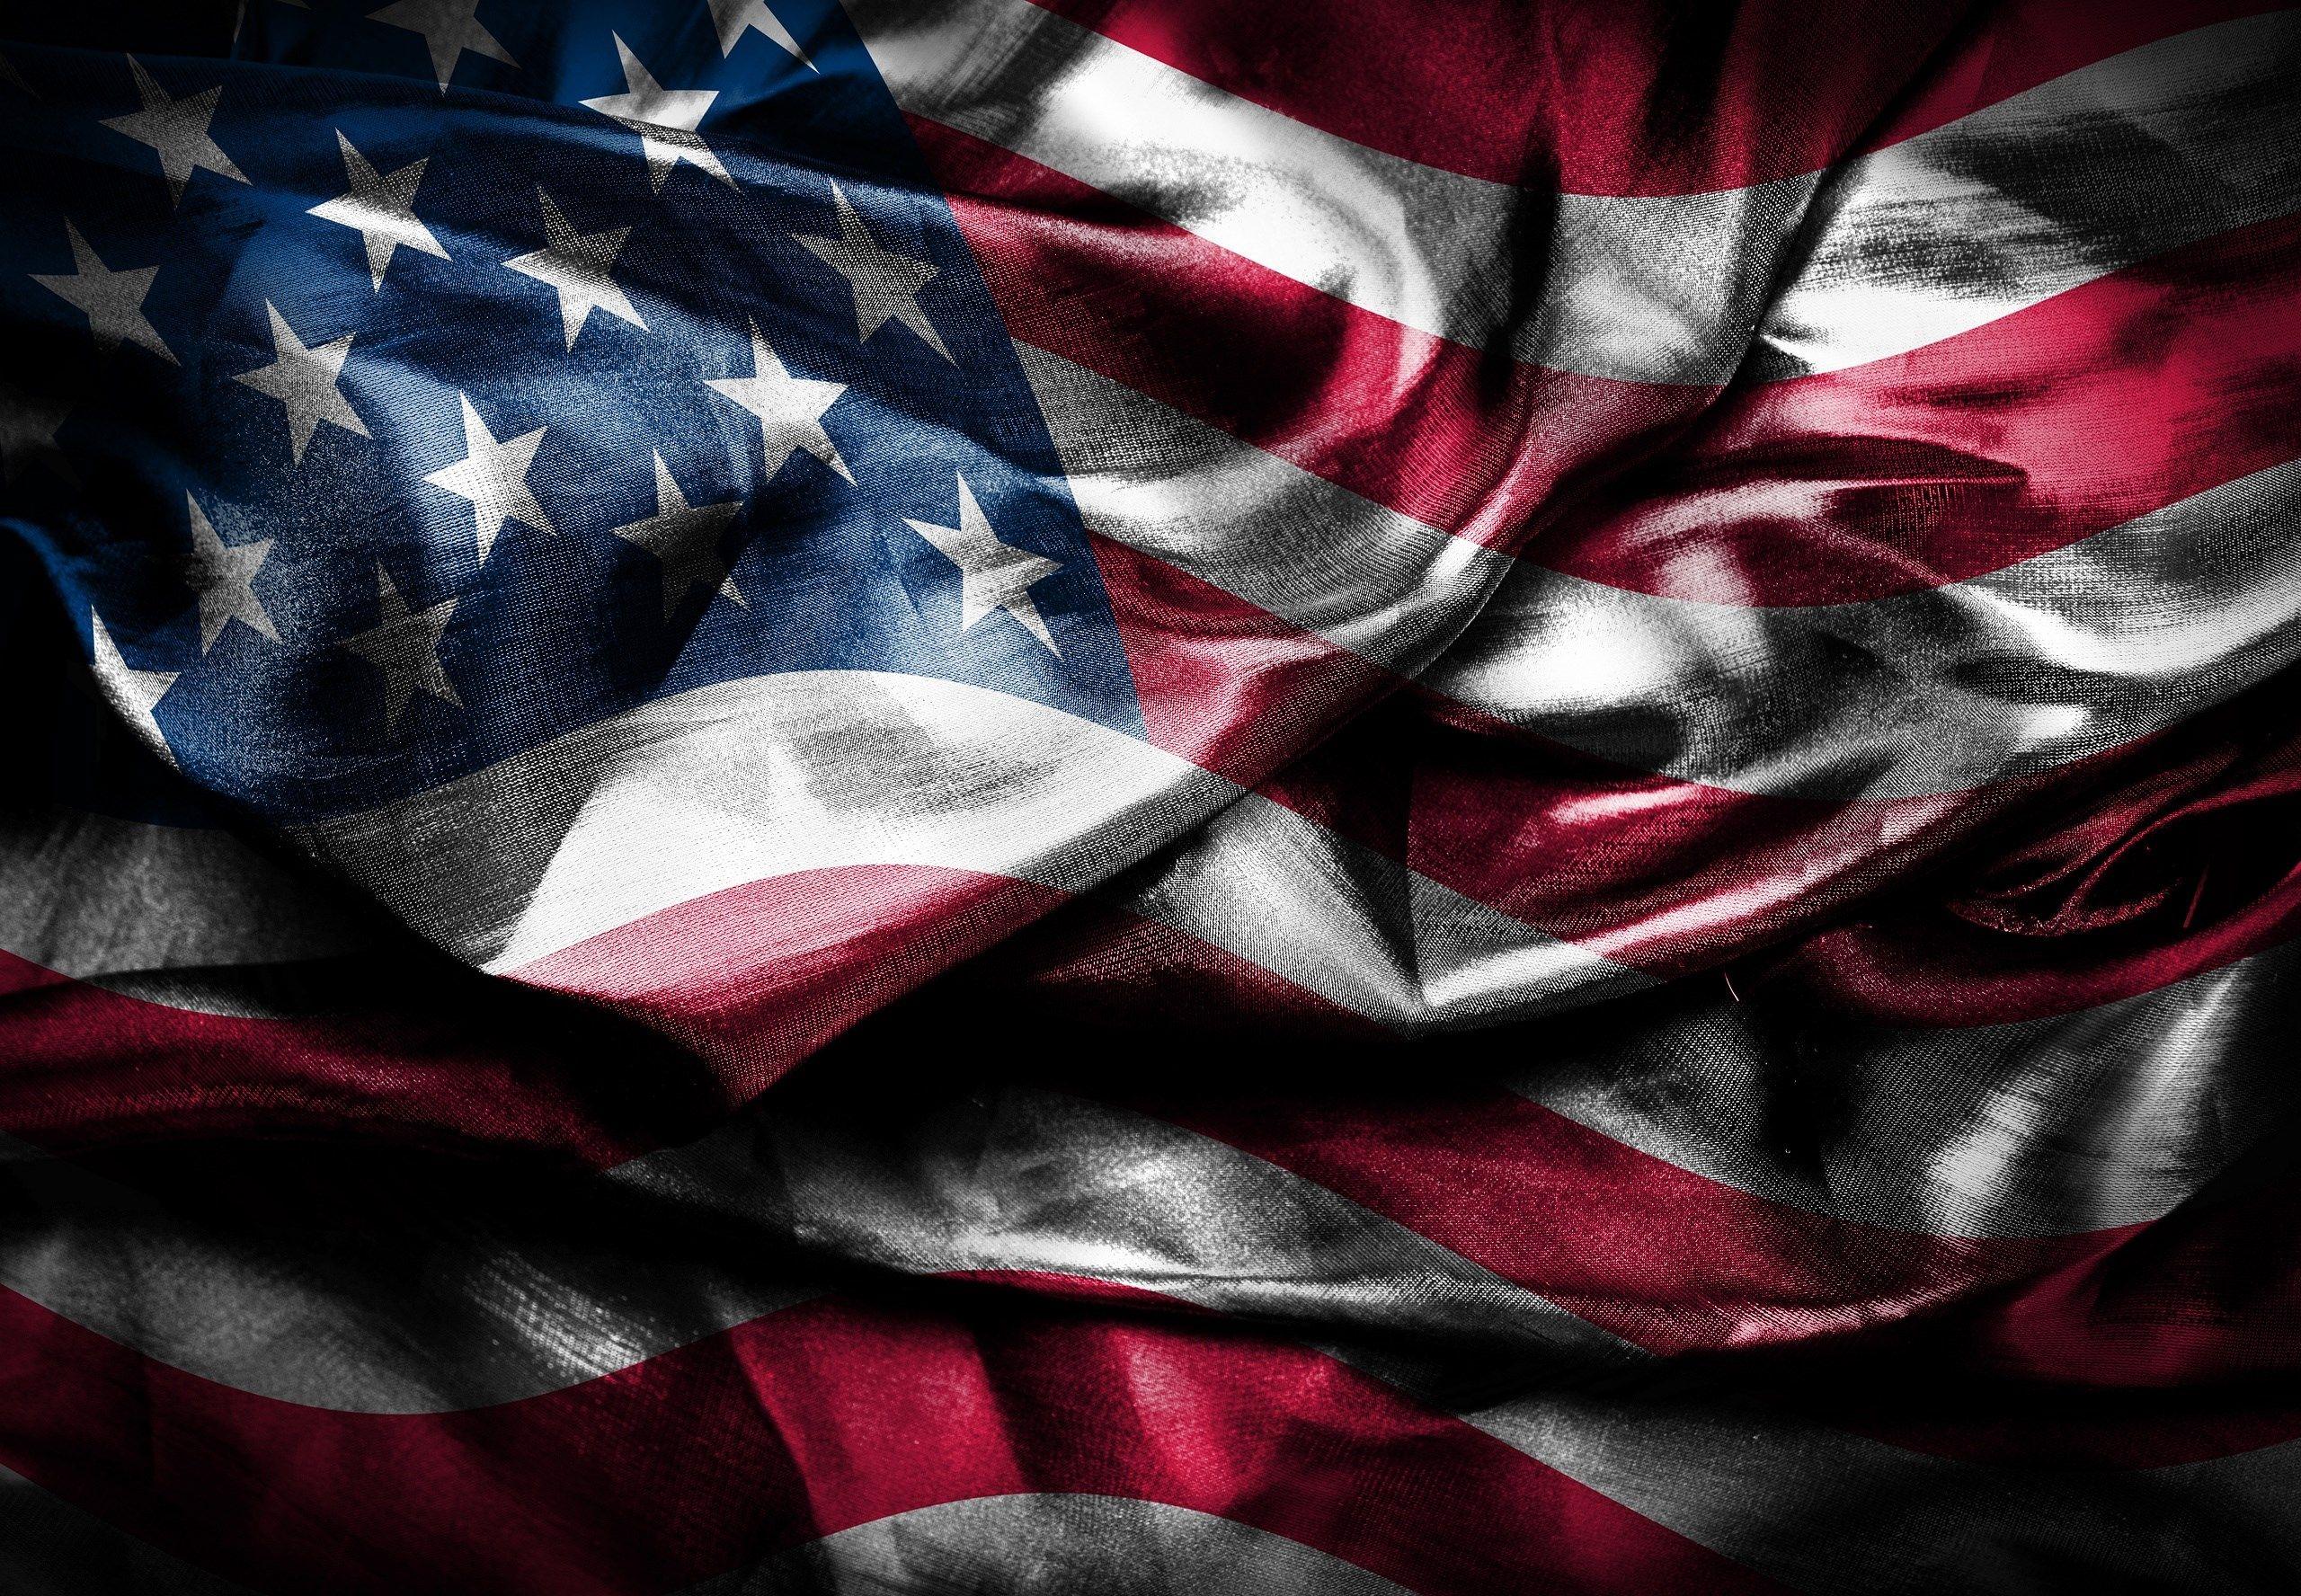 American flag 1080p high quality 2560x1776 hueputalo pinterest american flag 1080p high quality 2560x1776 voltagebd Gallery